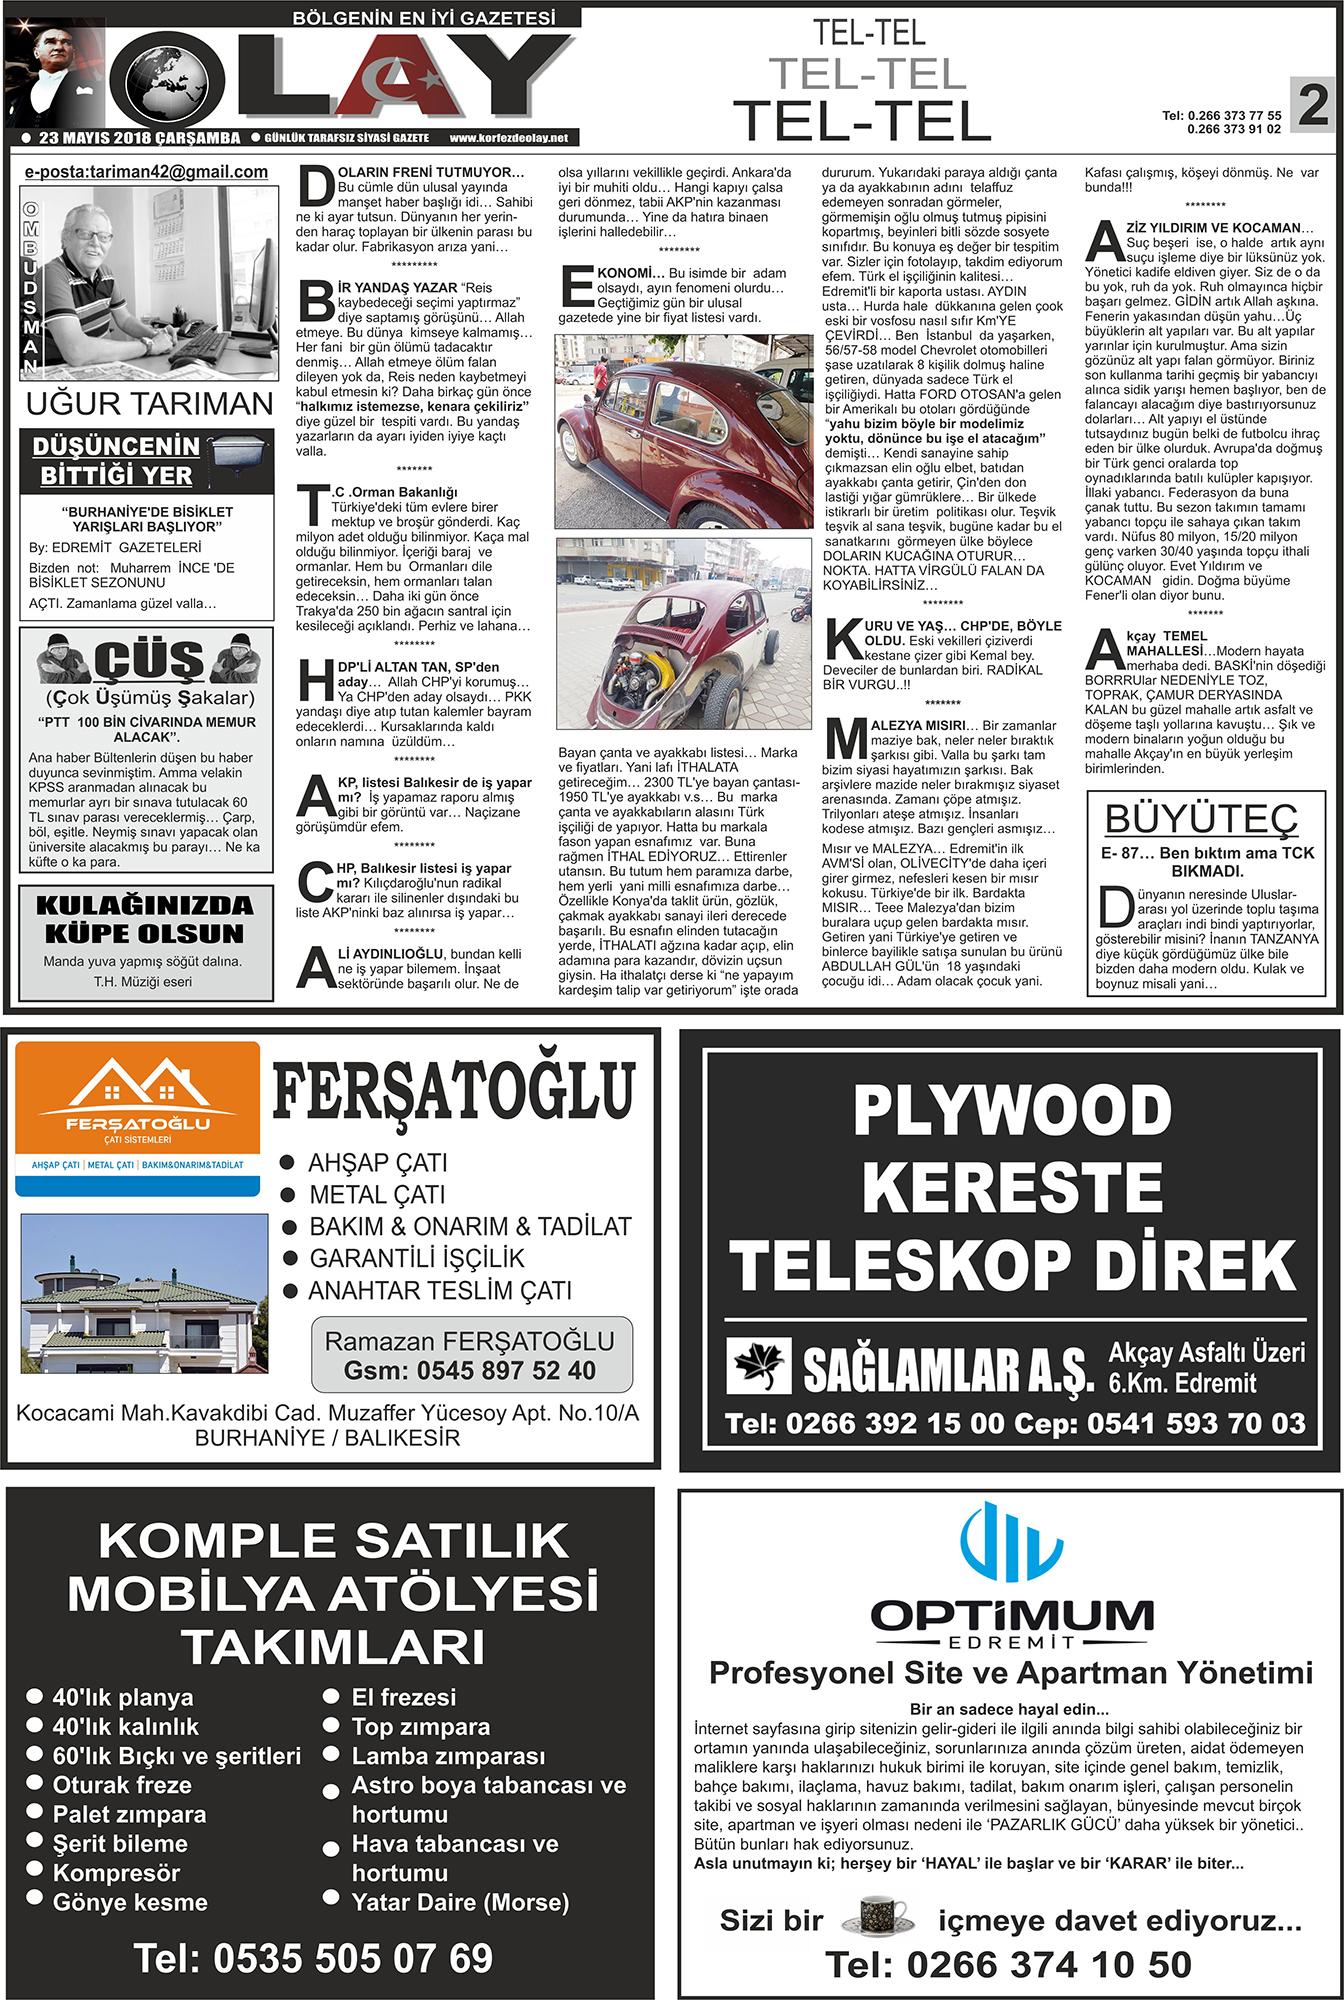 7 Eylul 2012 Gazetemiz Foto Galeri Edremit Olay Gazetesi